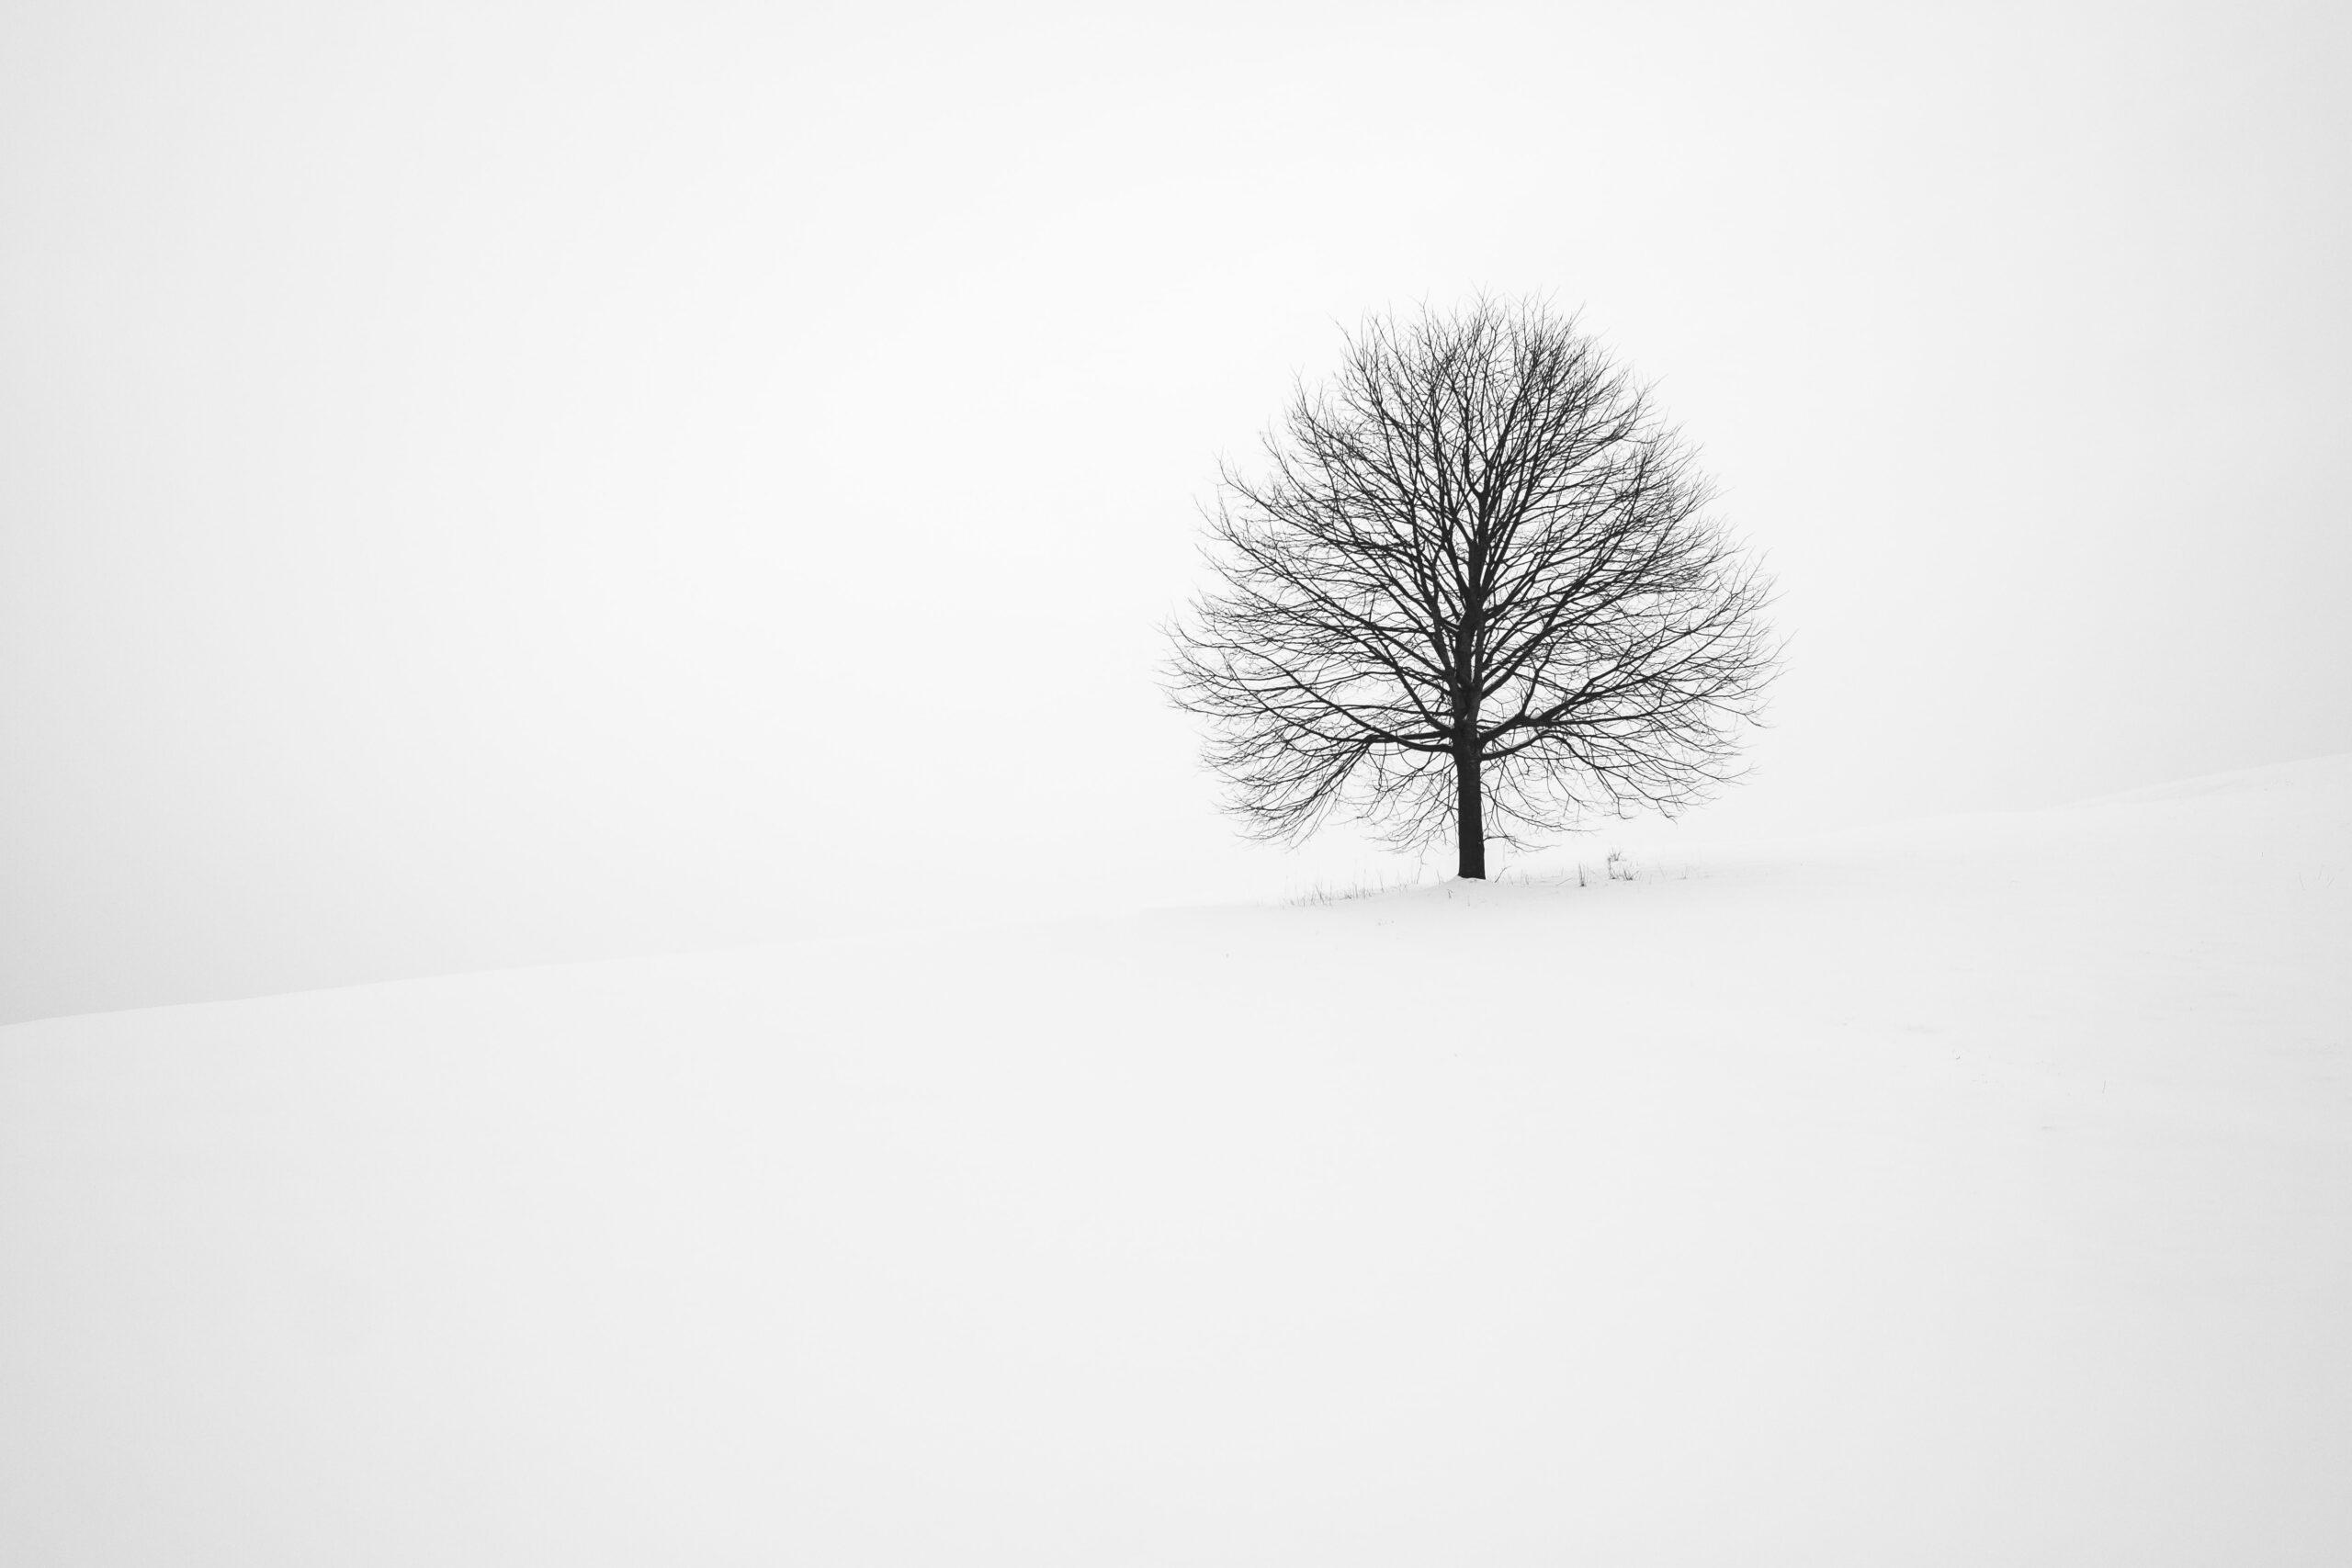 Single, bare tree in vast expanse of white snow.